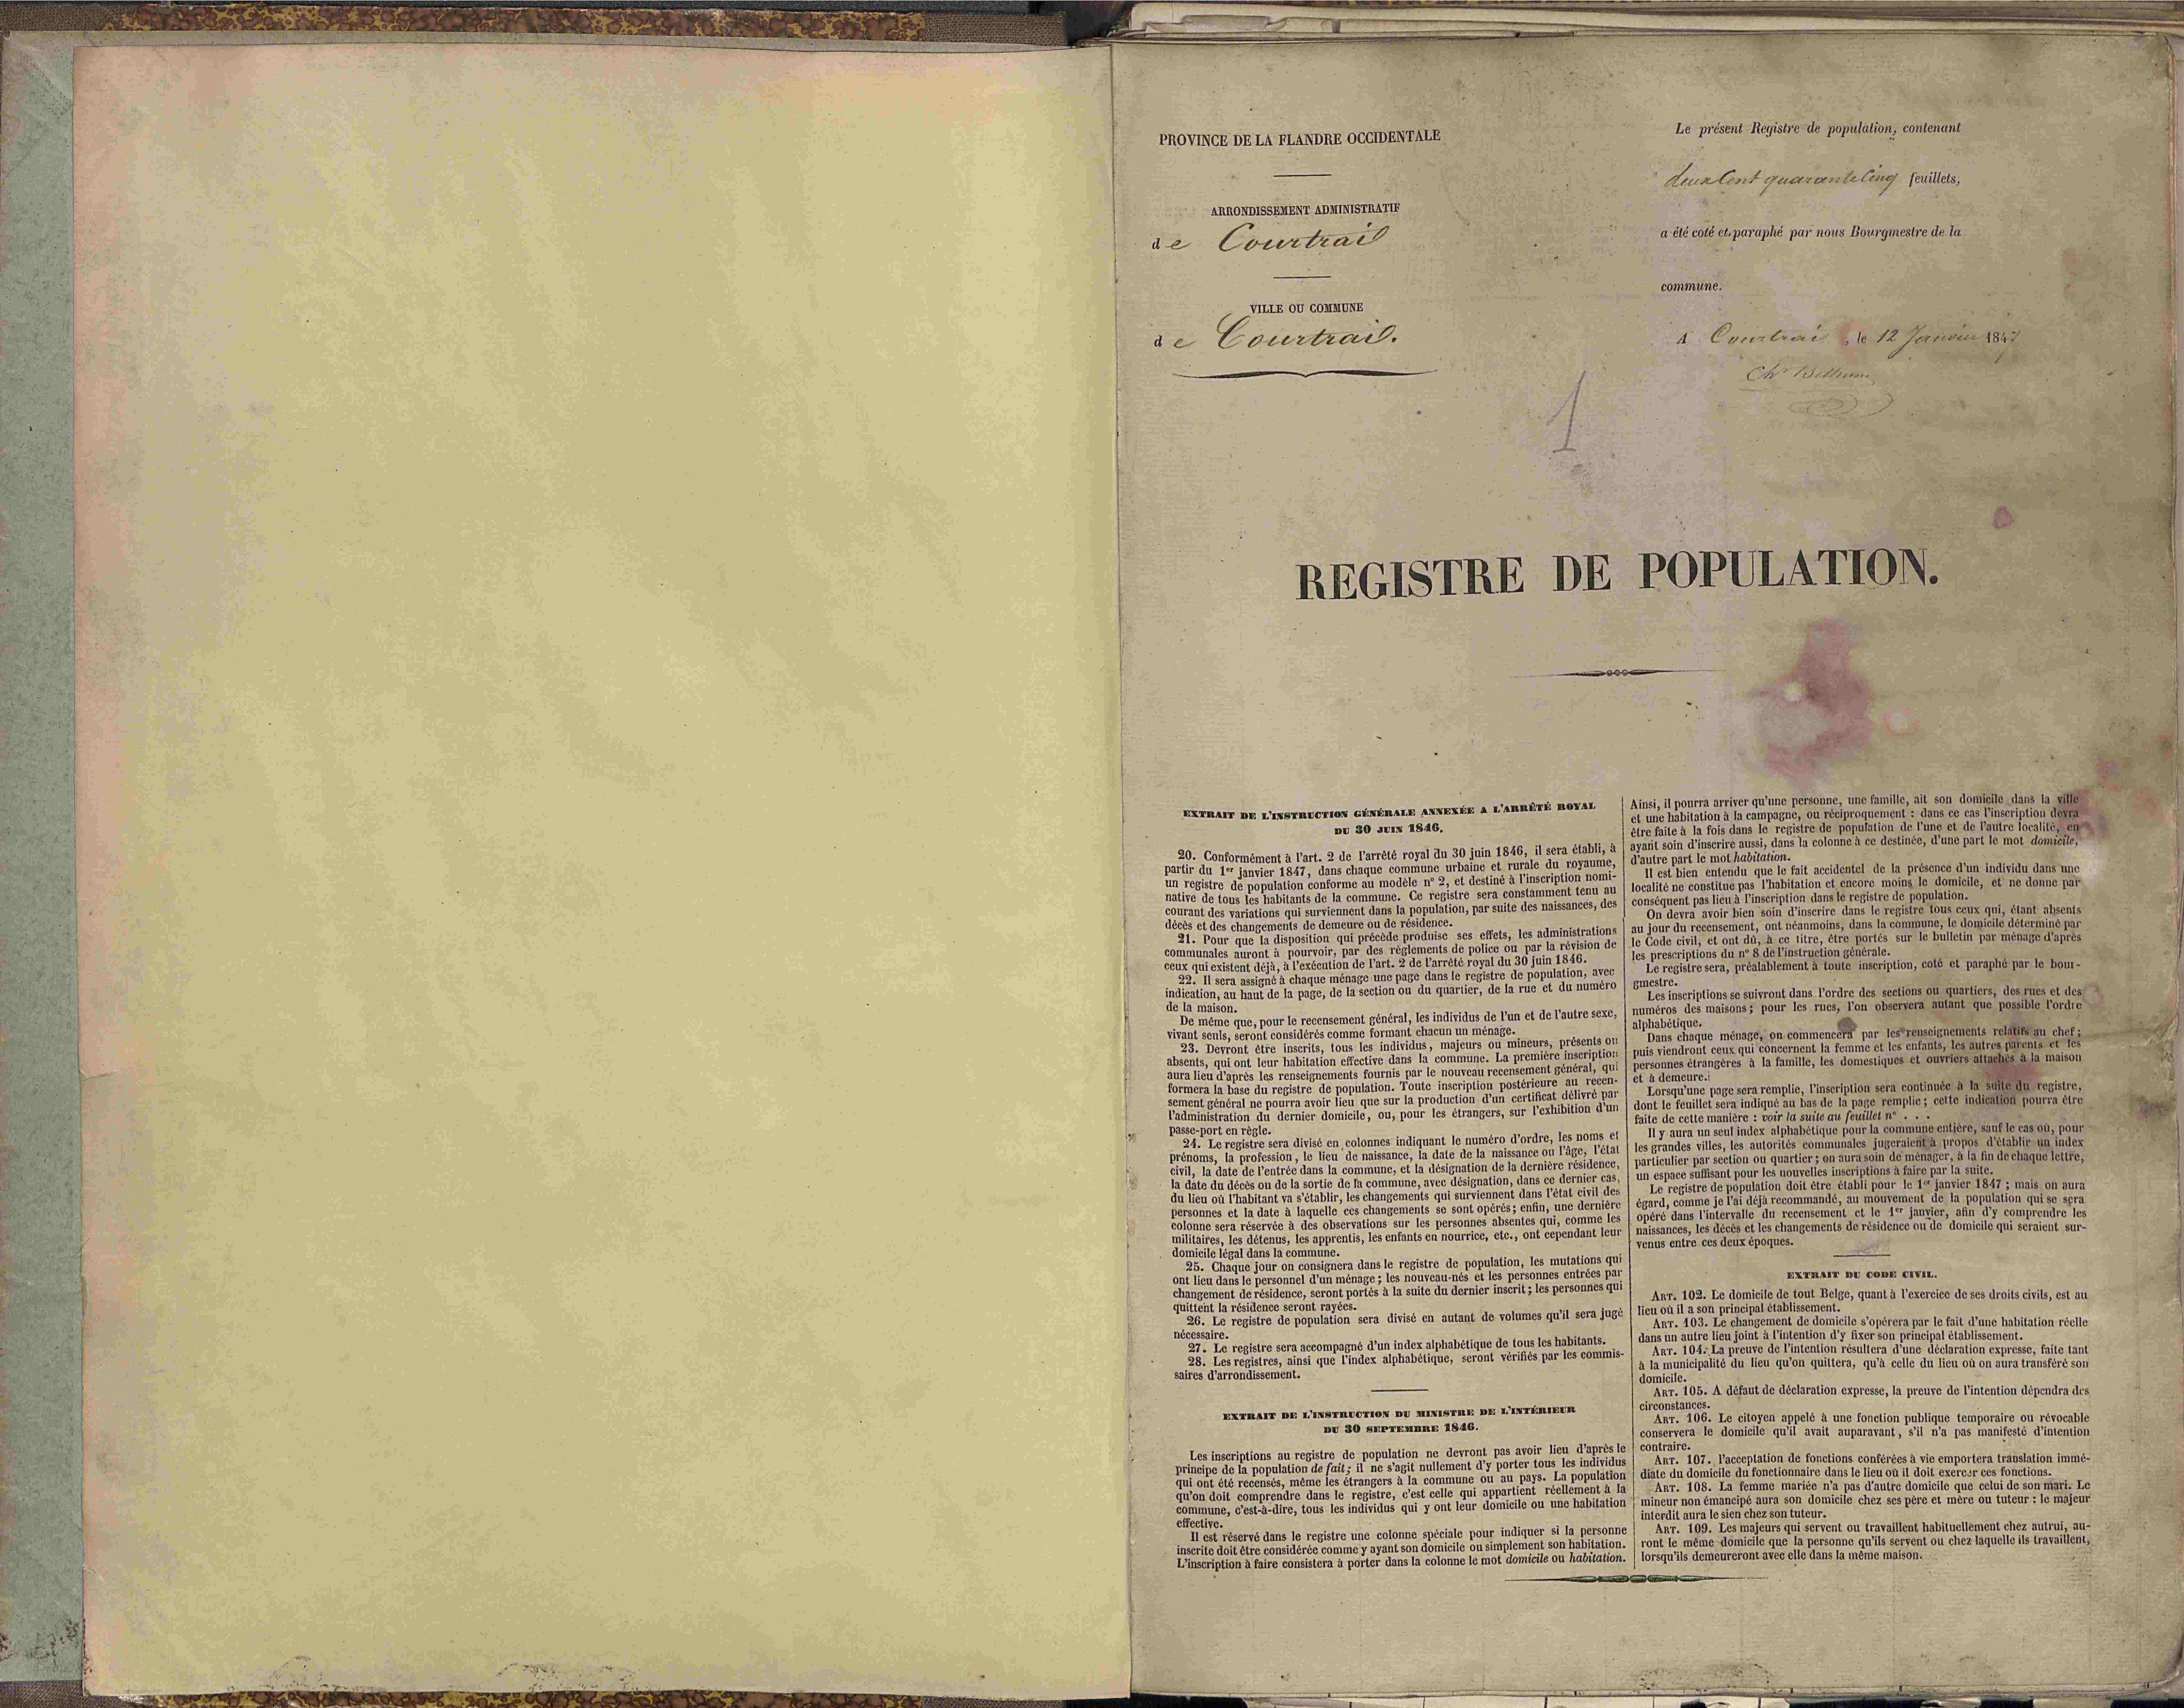 Bevolkingsregister Kortrijk 1846 boek 1